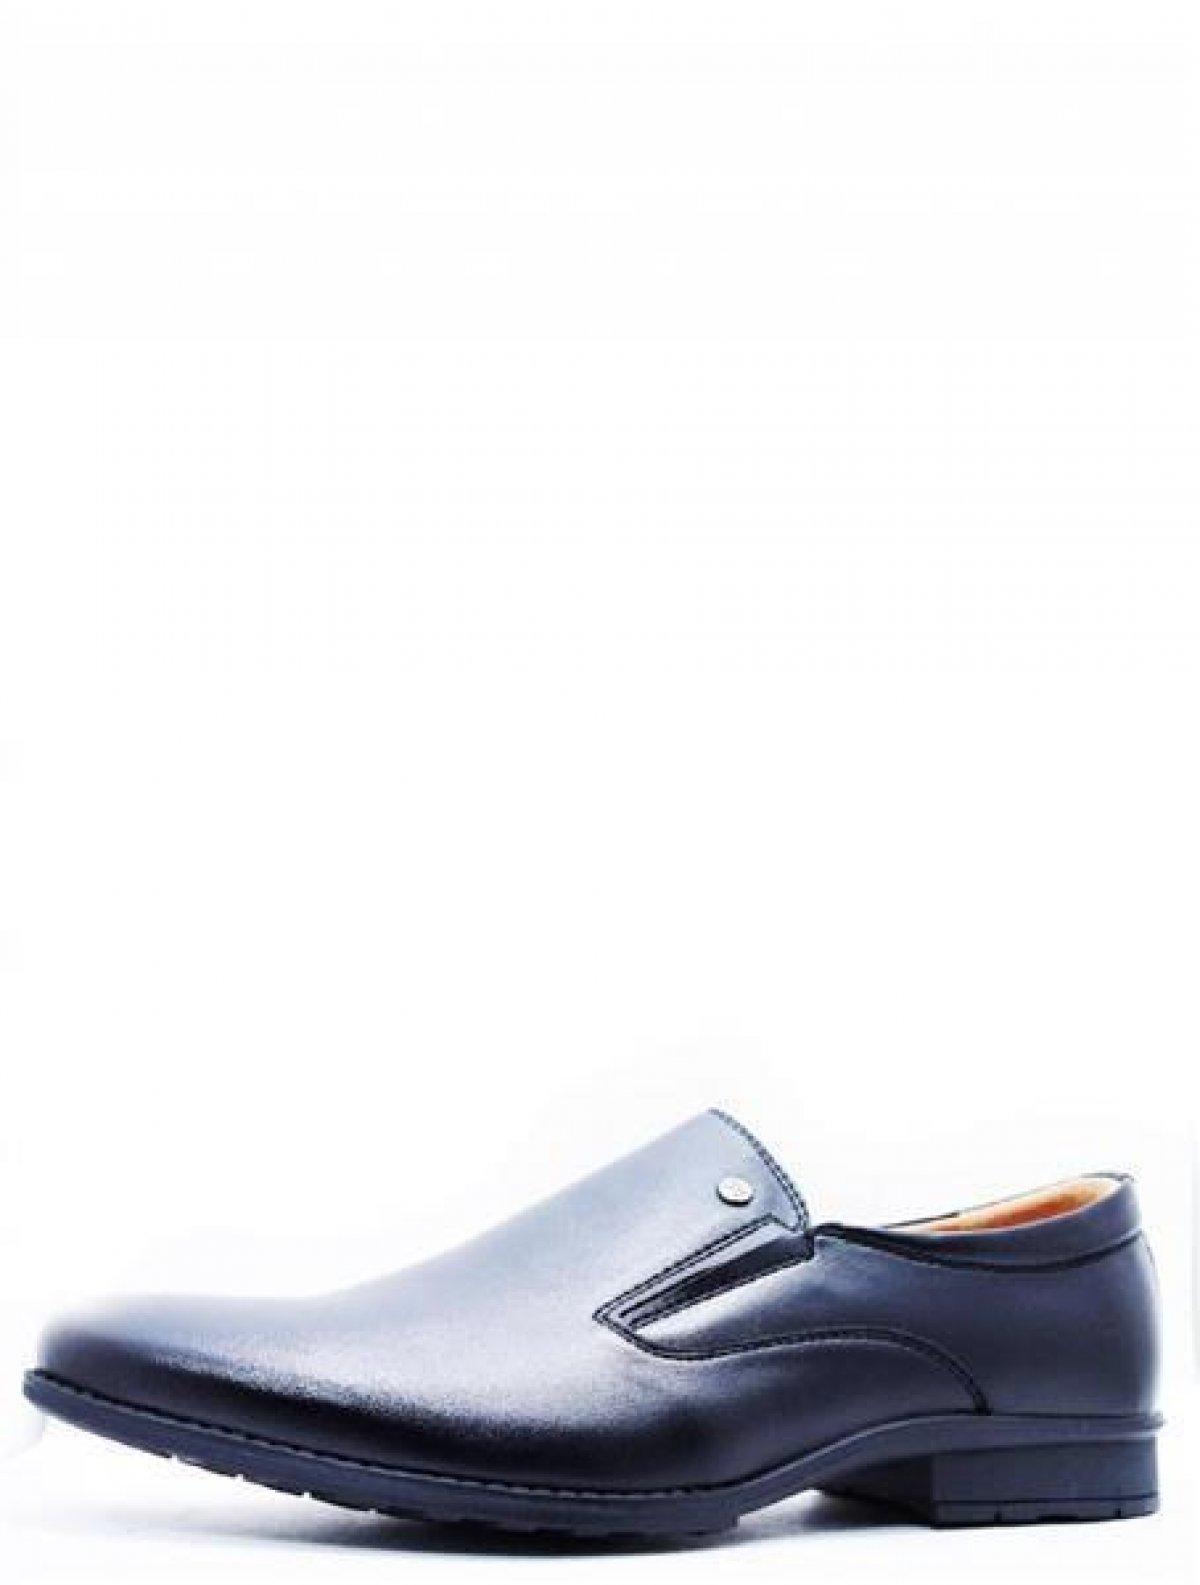 Carido B95-1P мужские туфли